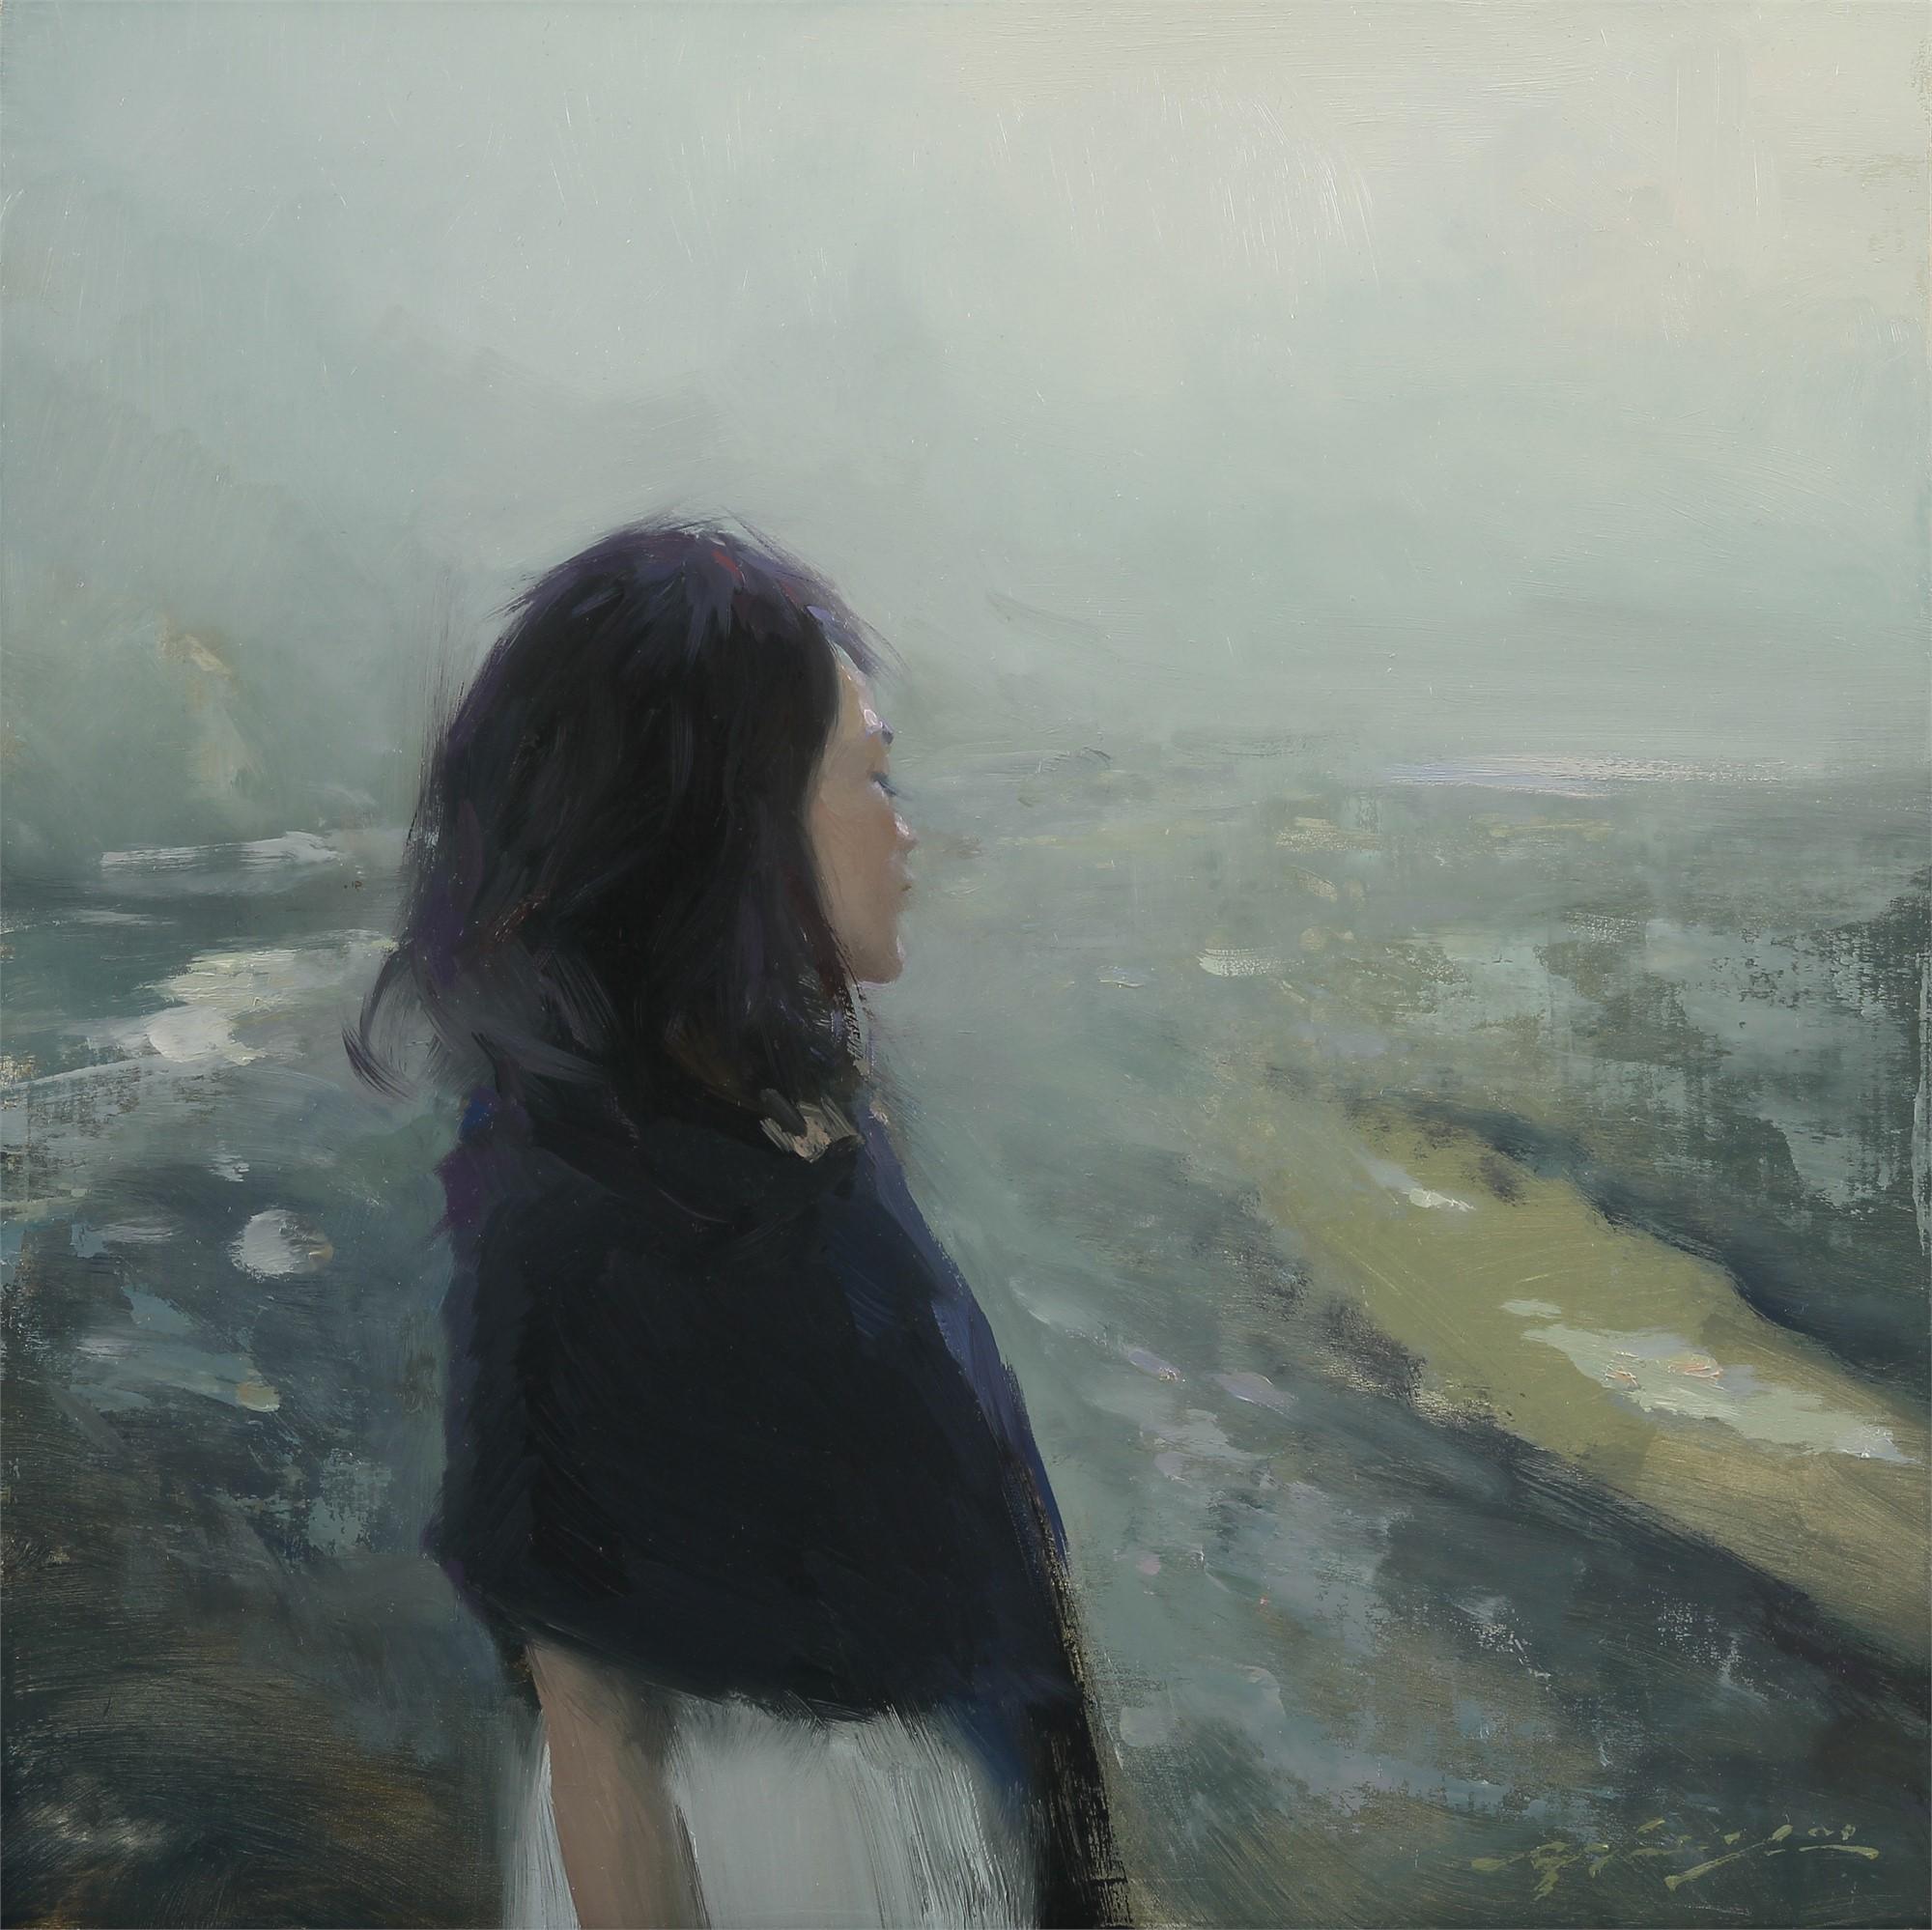 A Mysterious Spot by Hsin-Yao Tseng